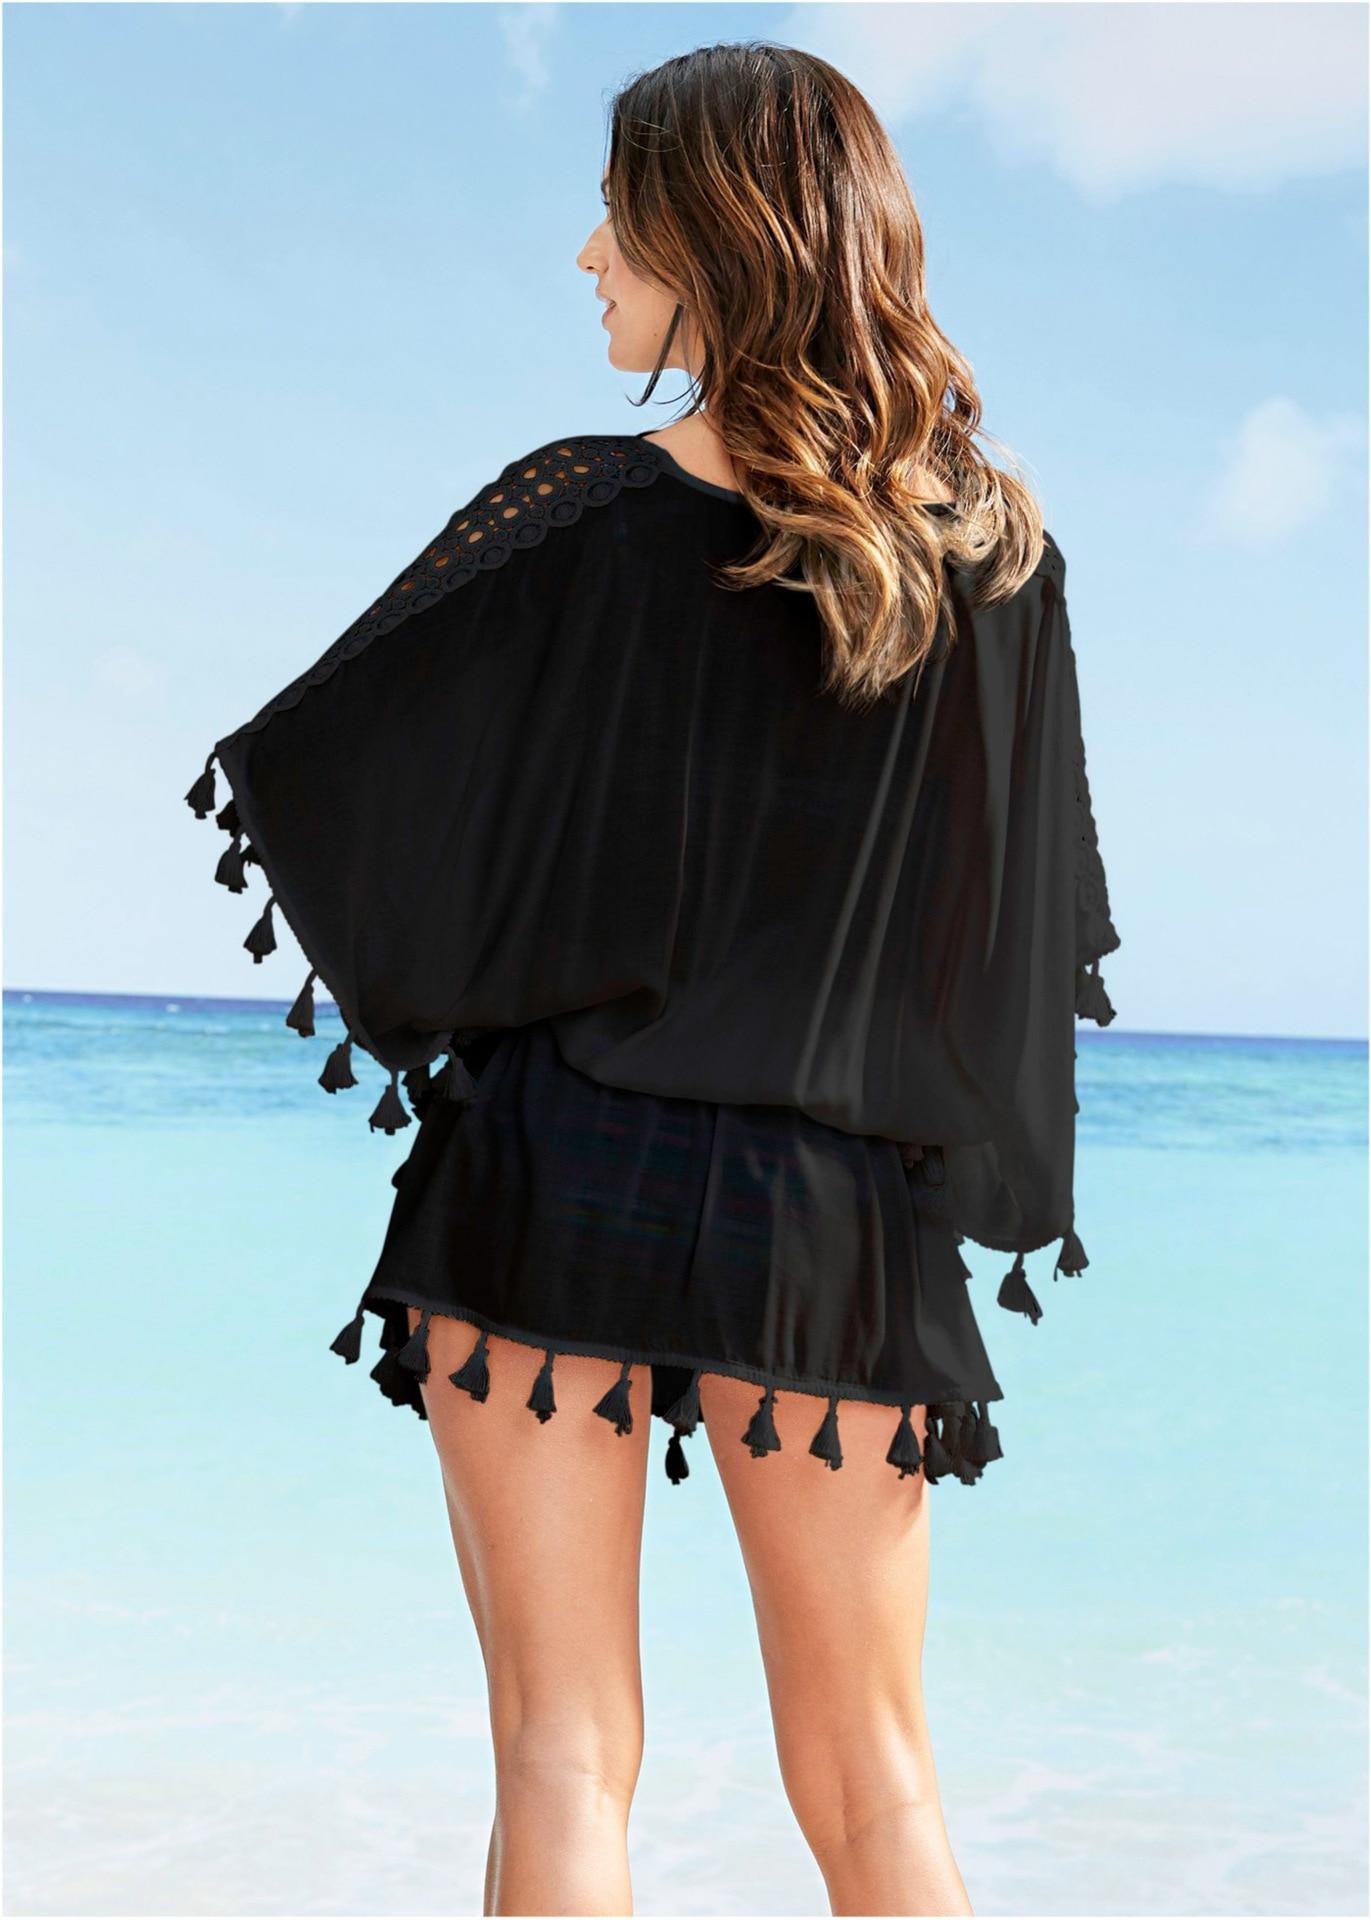 35f2ac3874f Beach Dresses 2019 Casual Fringe Boho Dress Plus Size Woman Beach ...